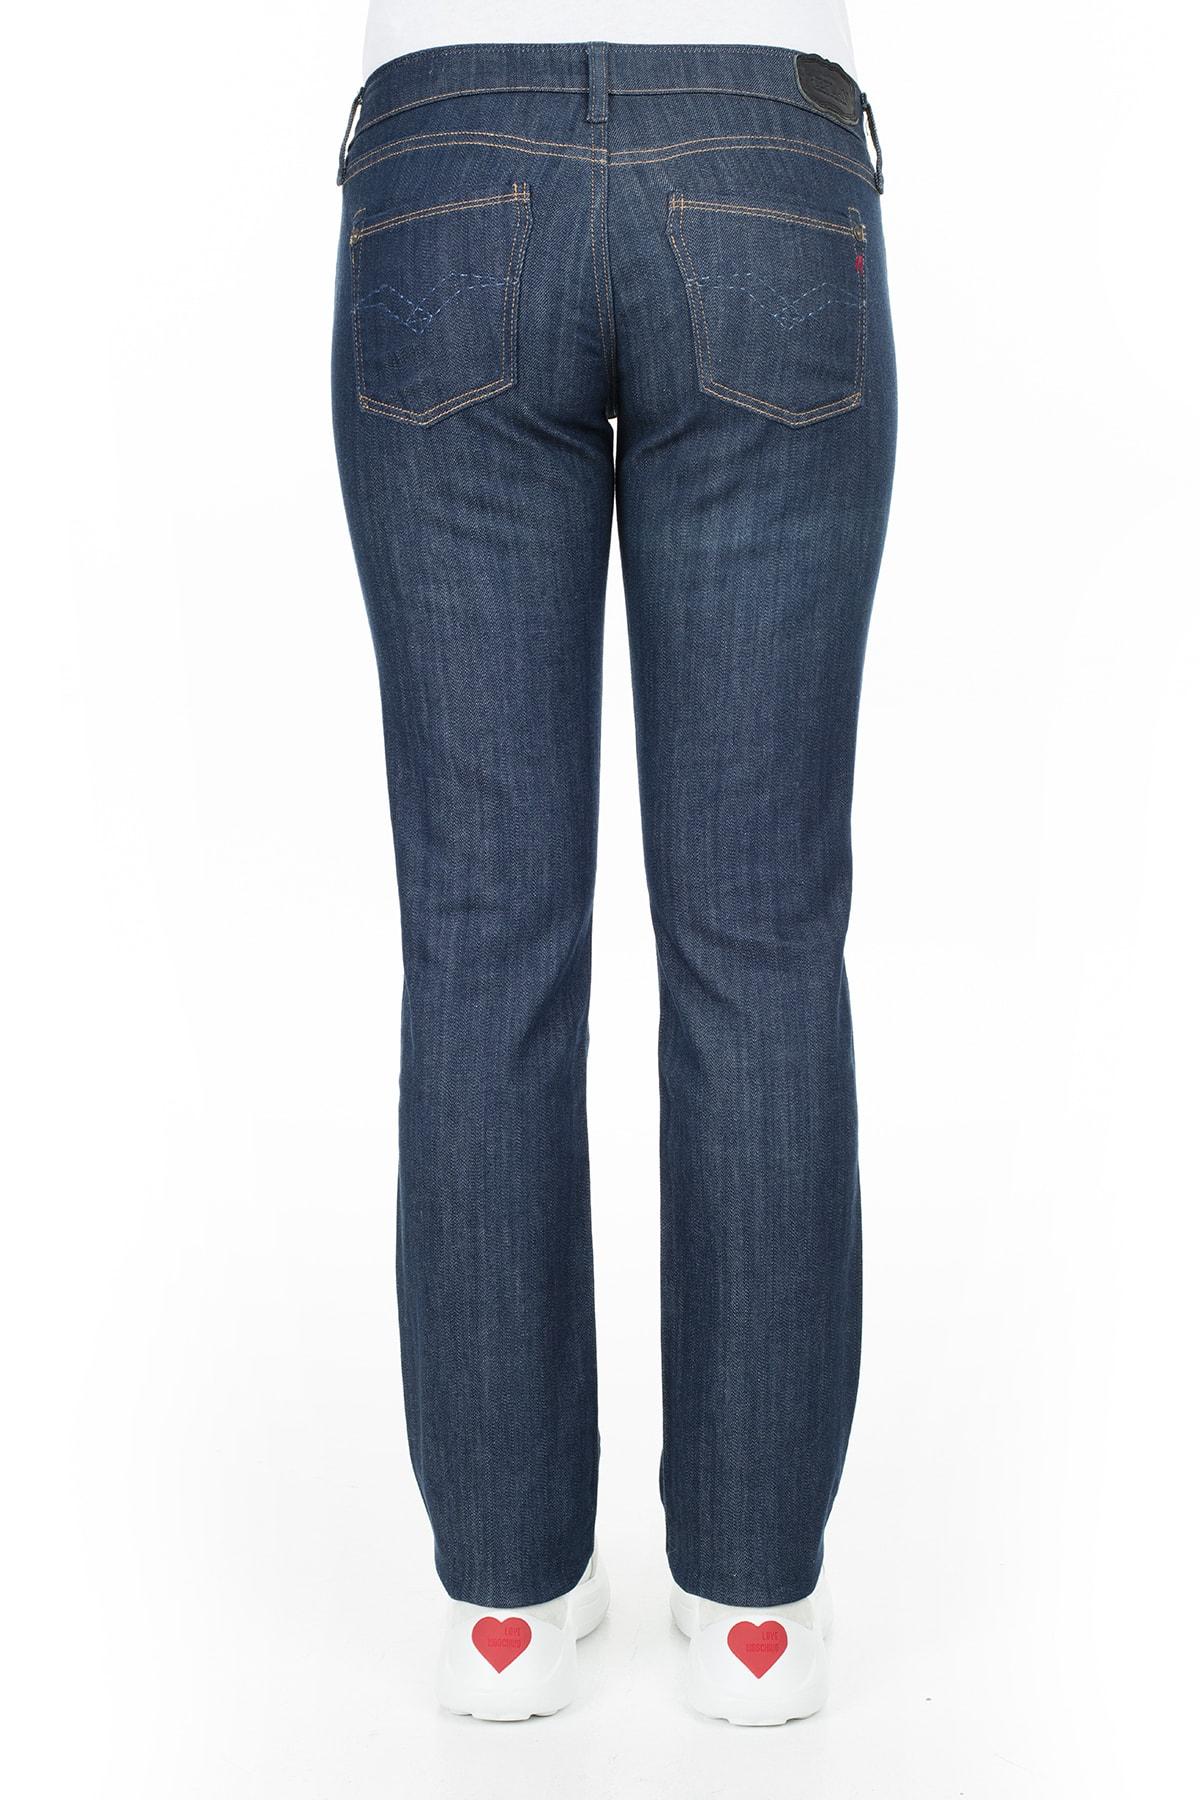 Replay Jeans Kadın Kot Pantolon Zoxwv591 3